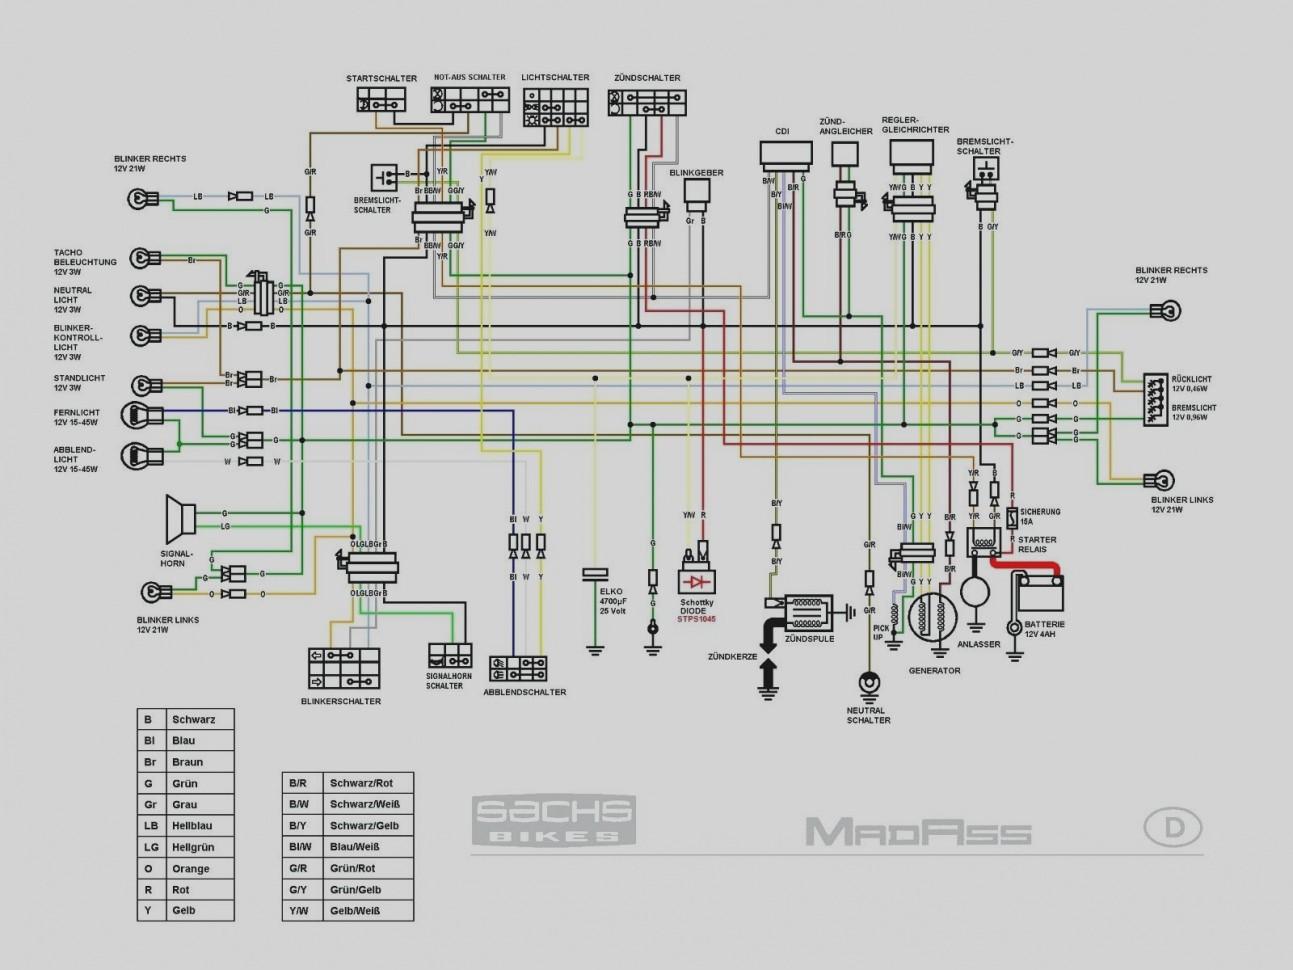 gy6 50cc wiring diagram amf harley davidson golf cart jonway 49cc scooter